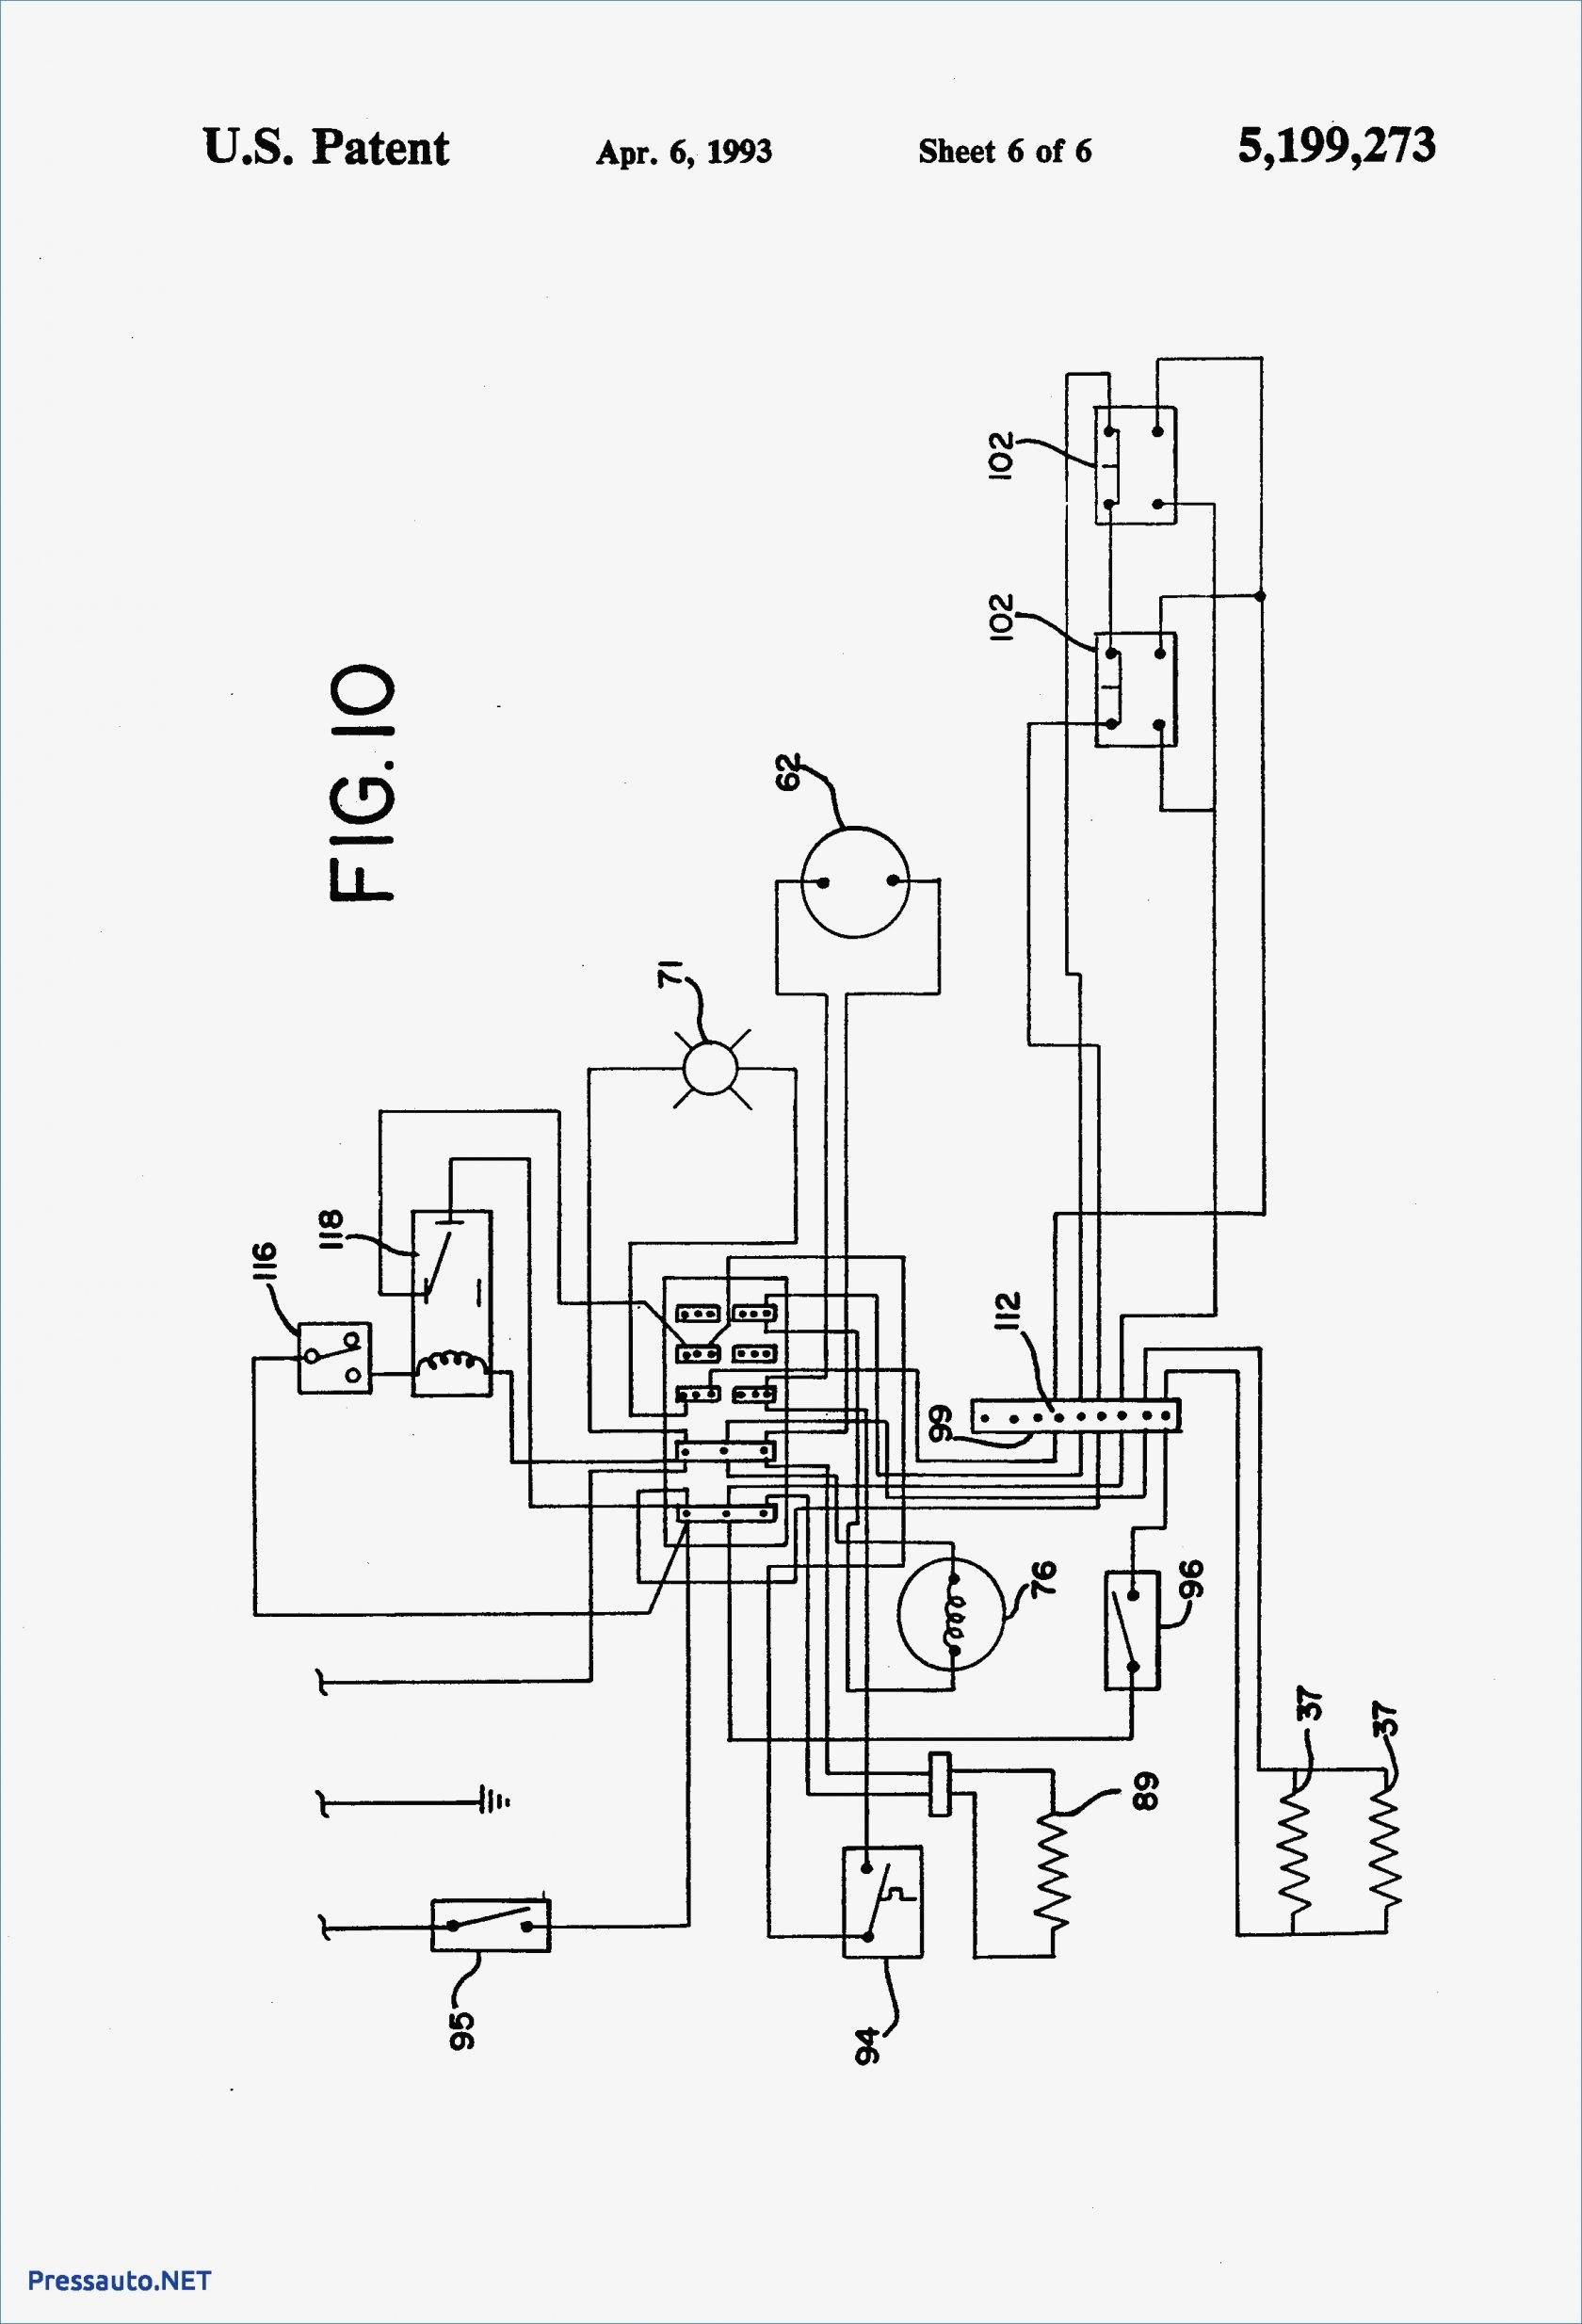 T 49f True Freezer Wiring Diagram - Meyer Snow Plow Switch Wiring Diagram |  Bege Wiring Diagram | True T 49f Wiring Diagram Free |  | Bege Wiring Diagram